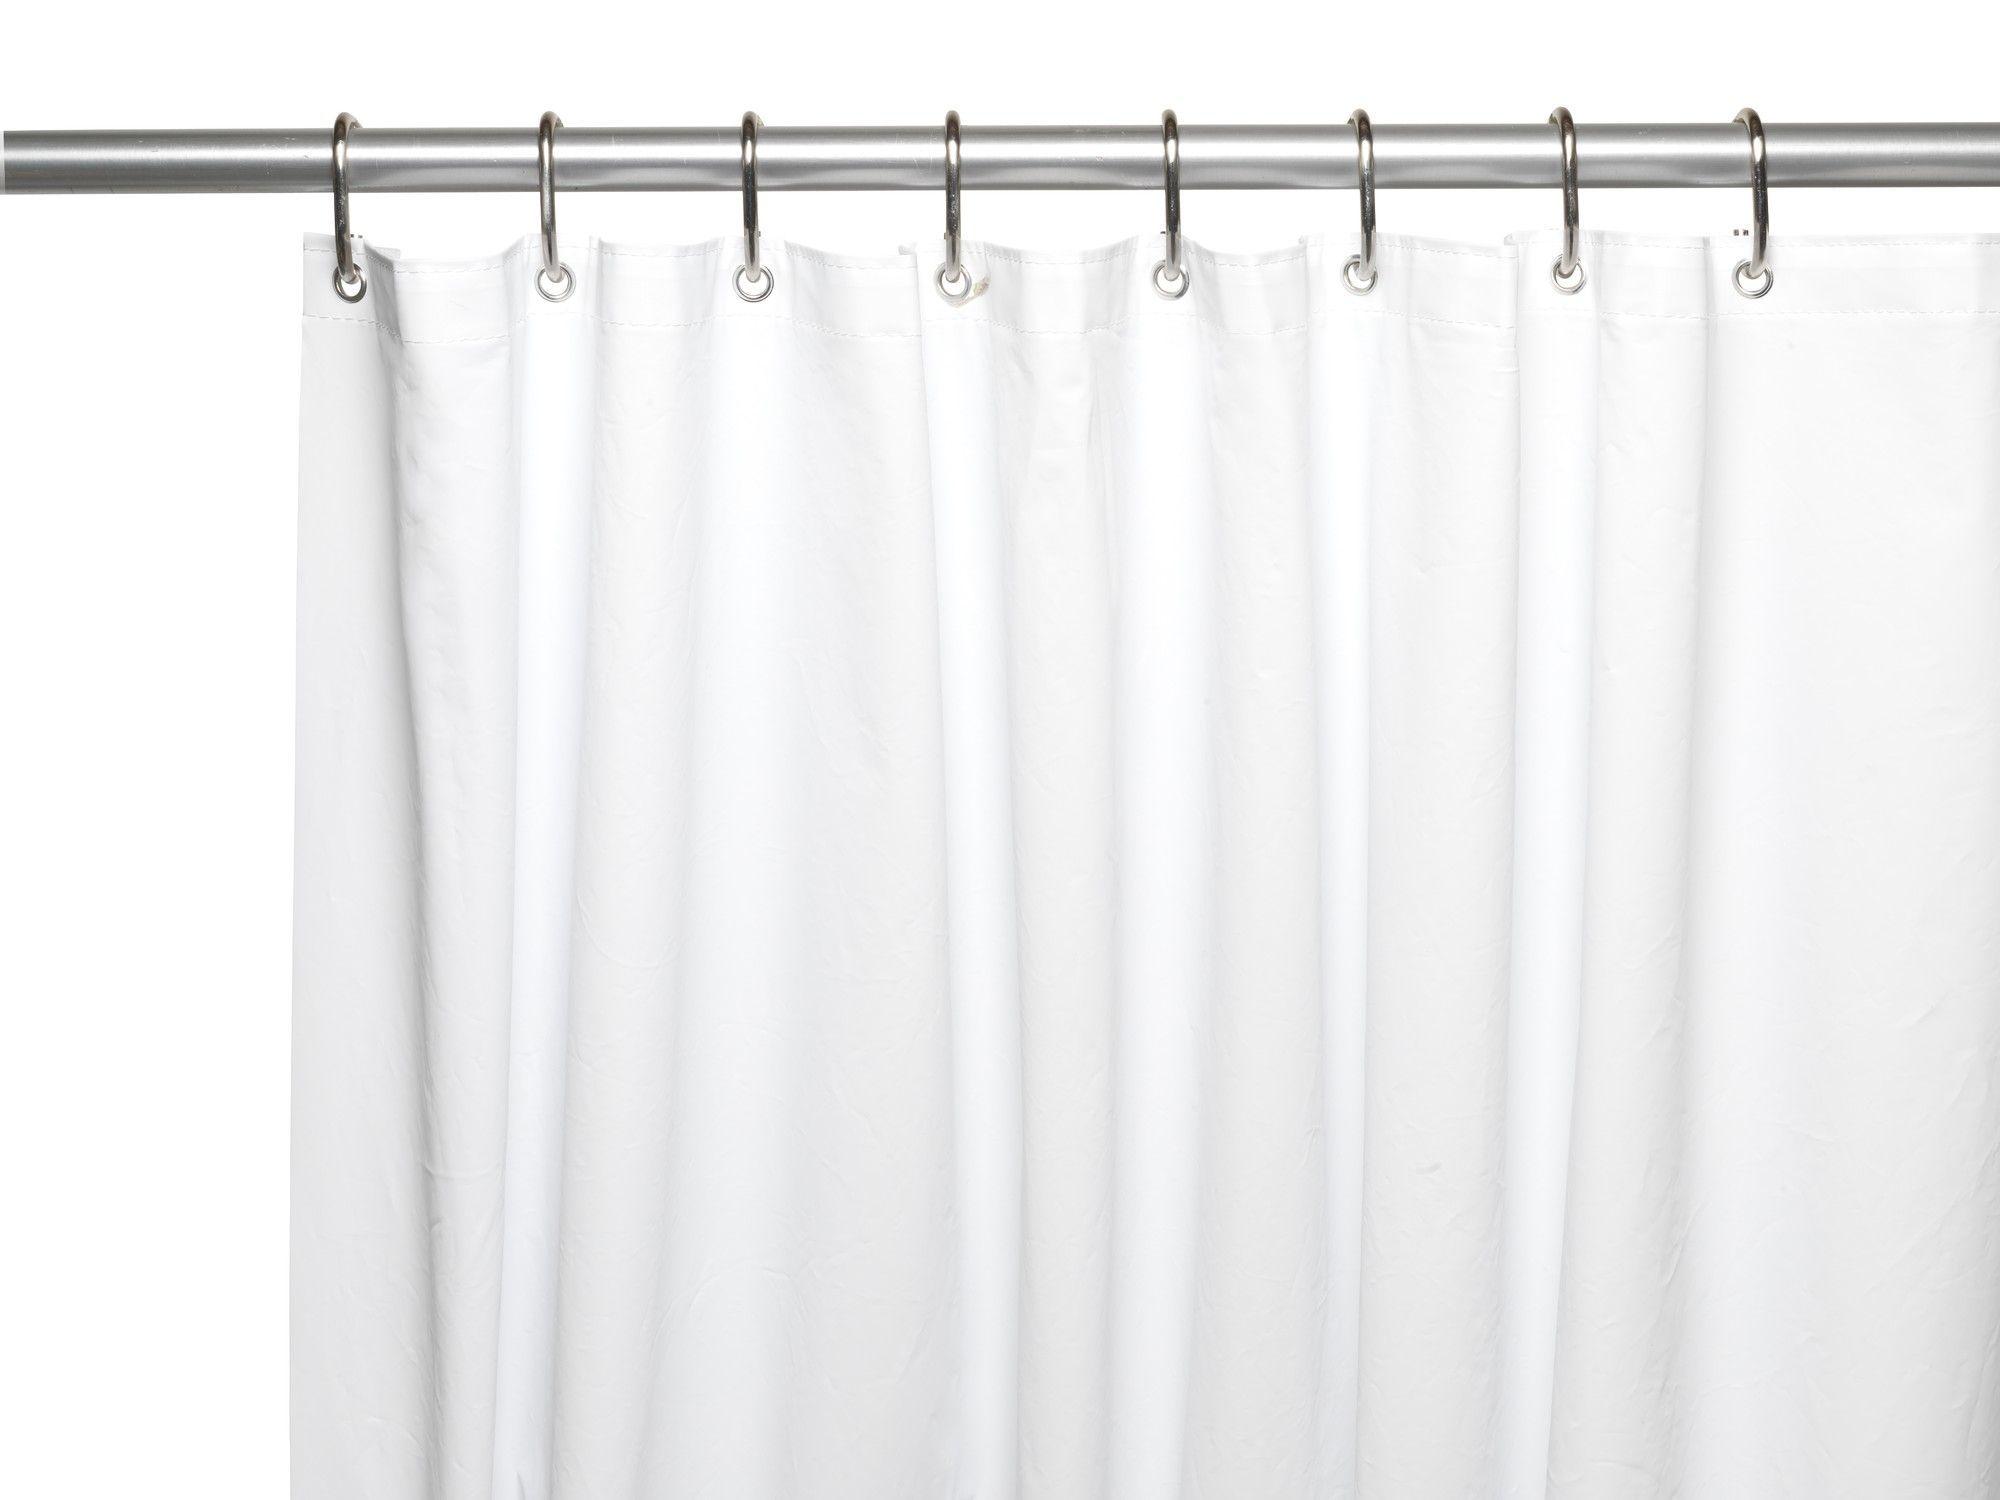 Dareios Peva Single Shower Curtain Liner Vinyl Shower Curtains